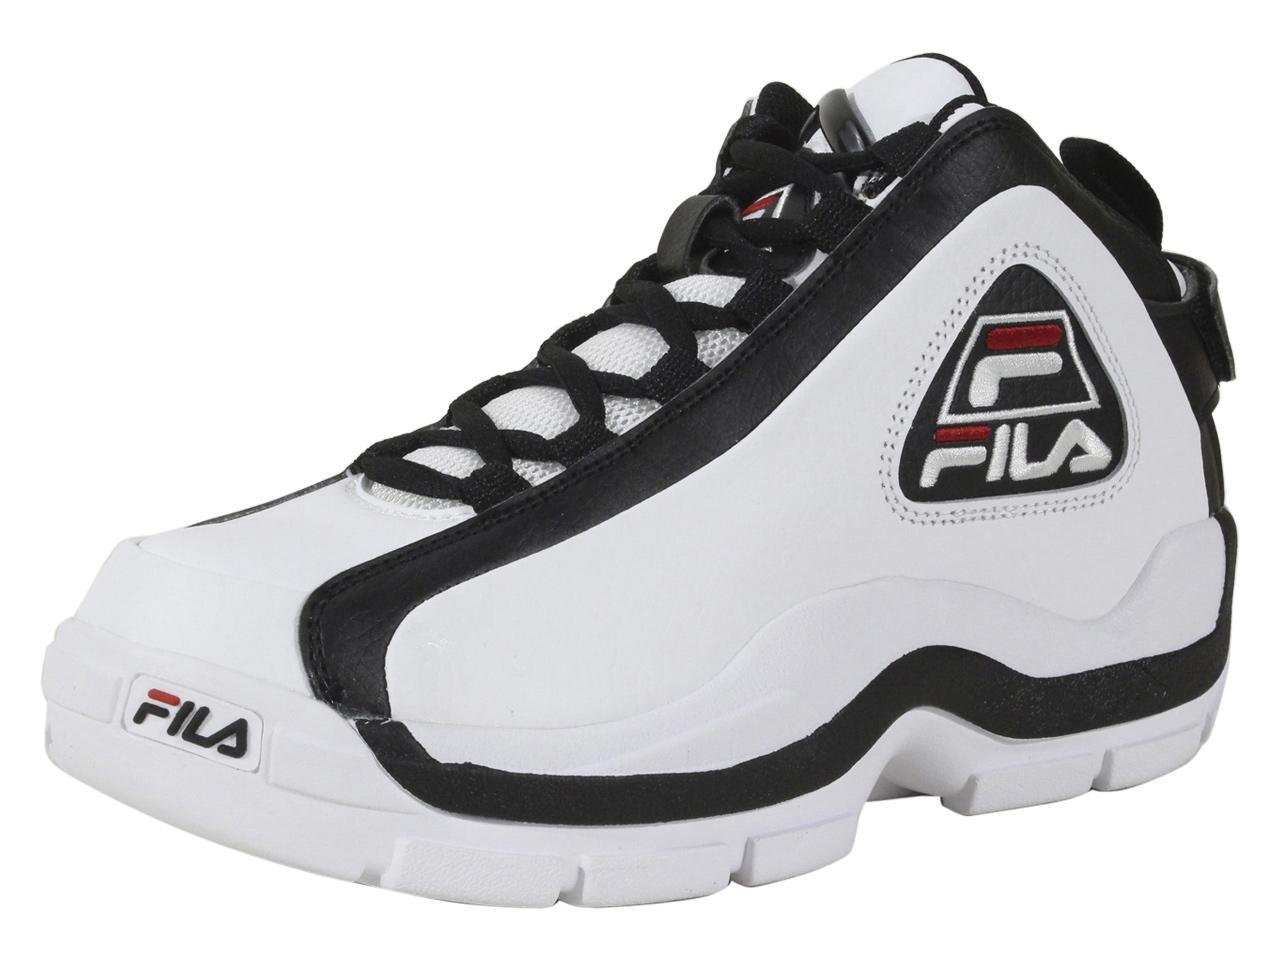 Fila Men's Grant Hill 2 Sneakers Shoes